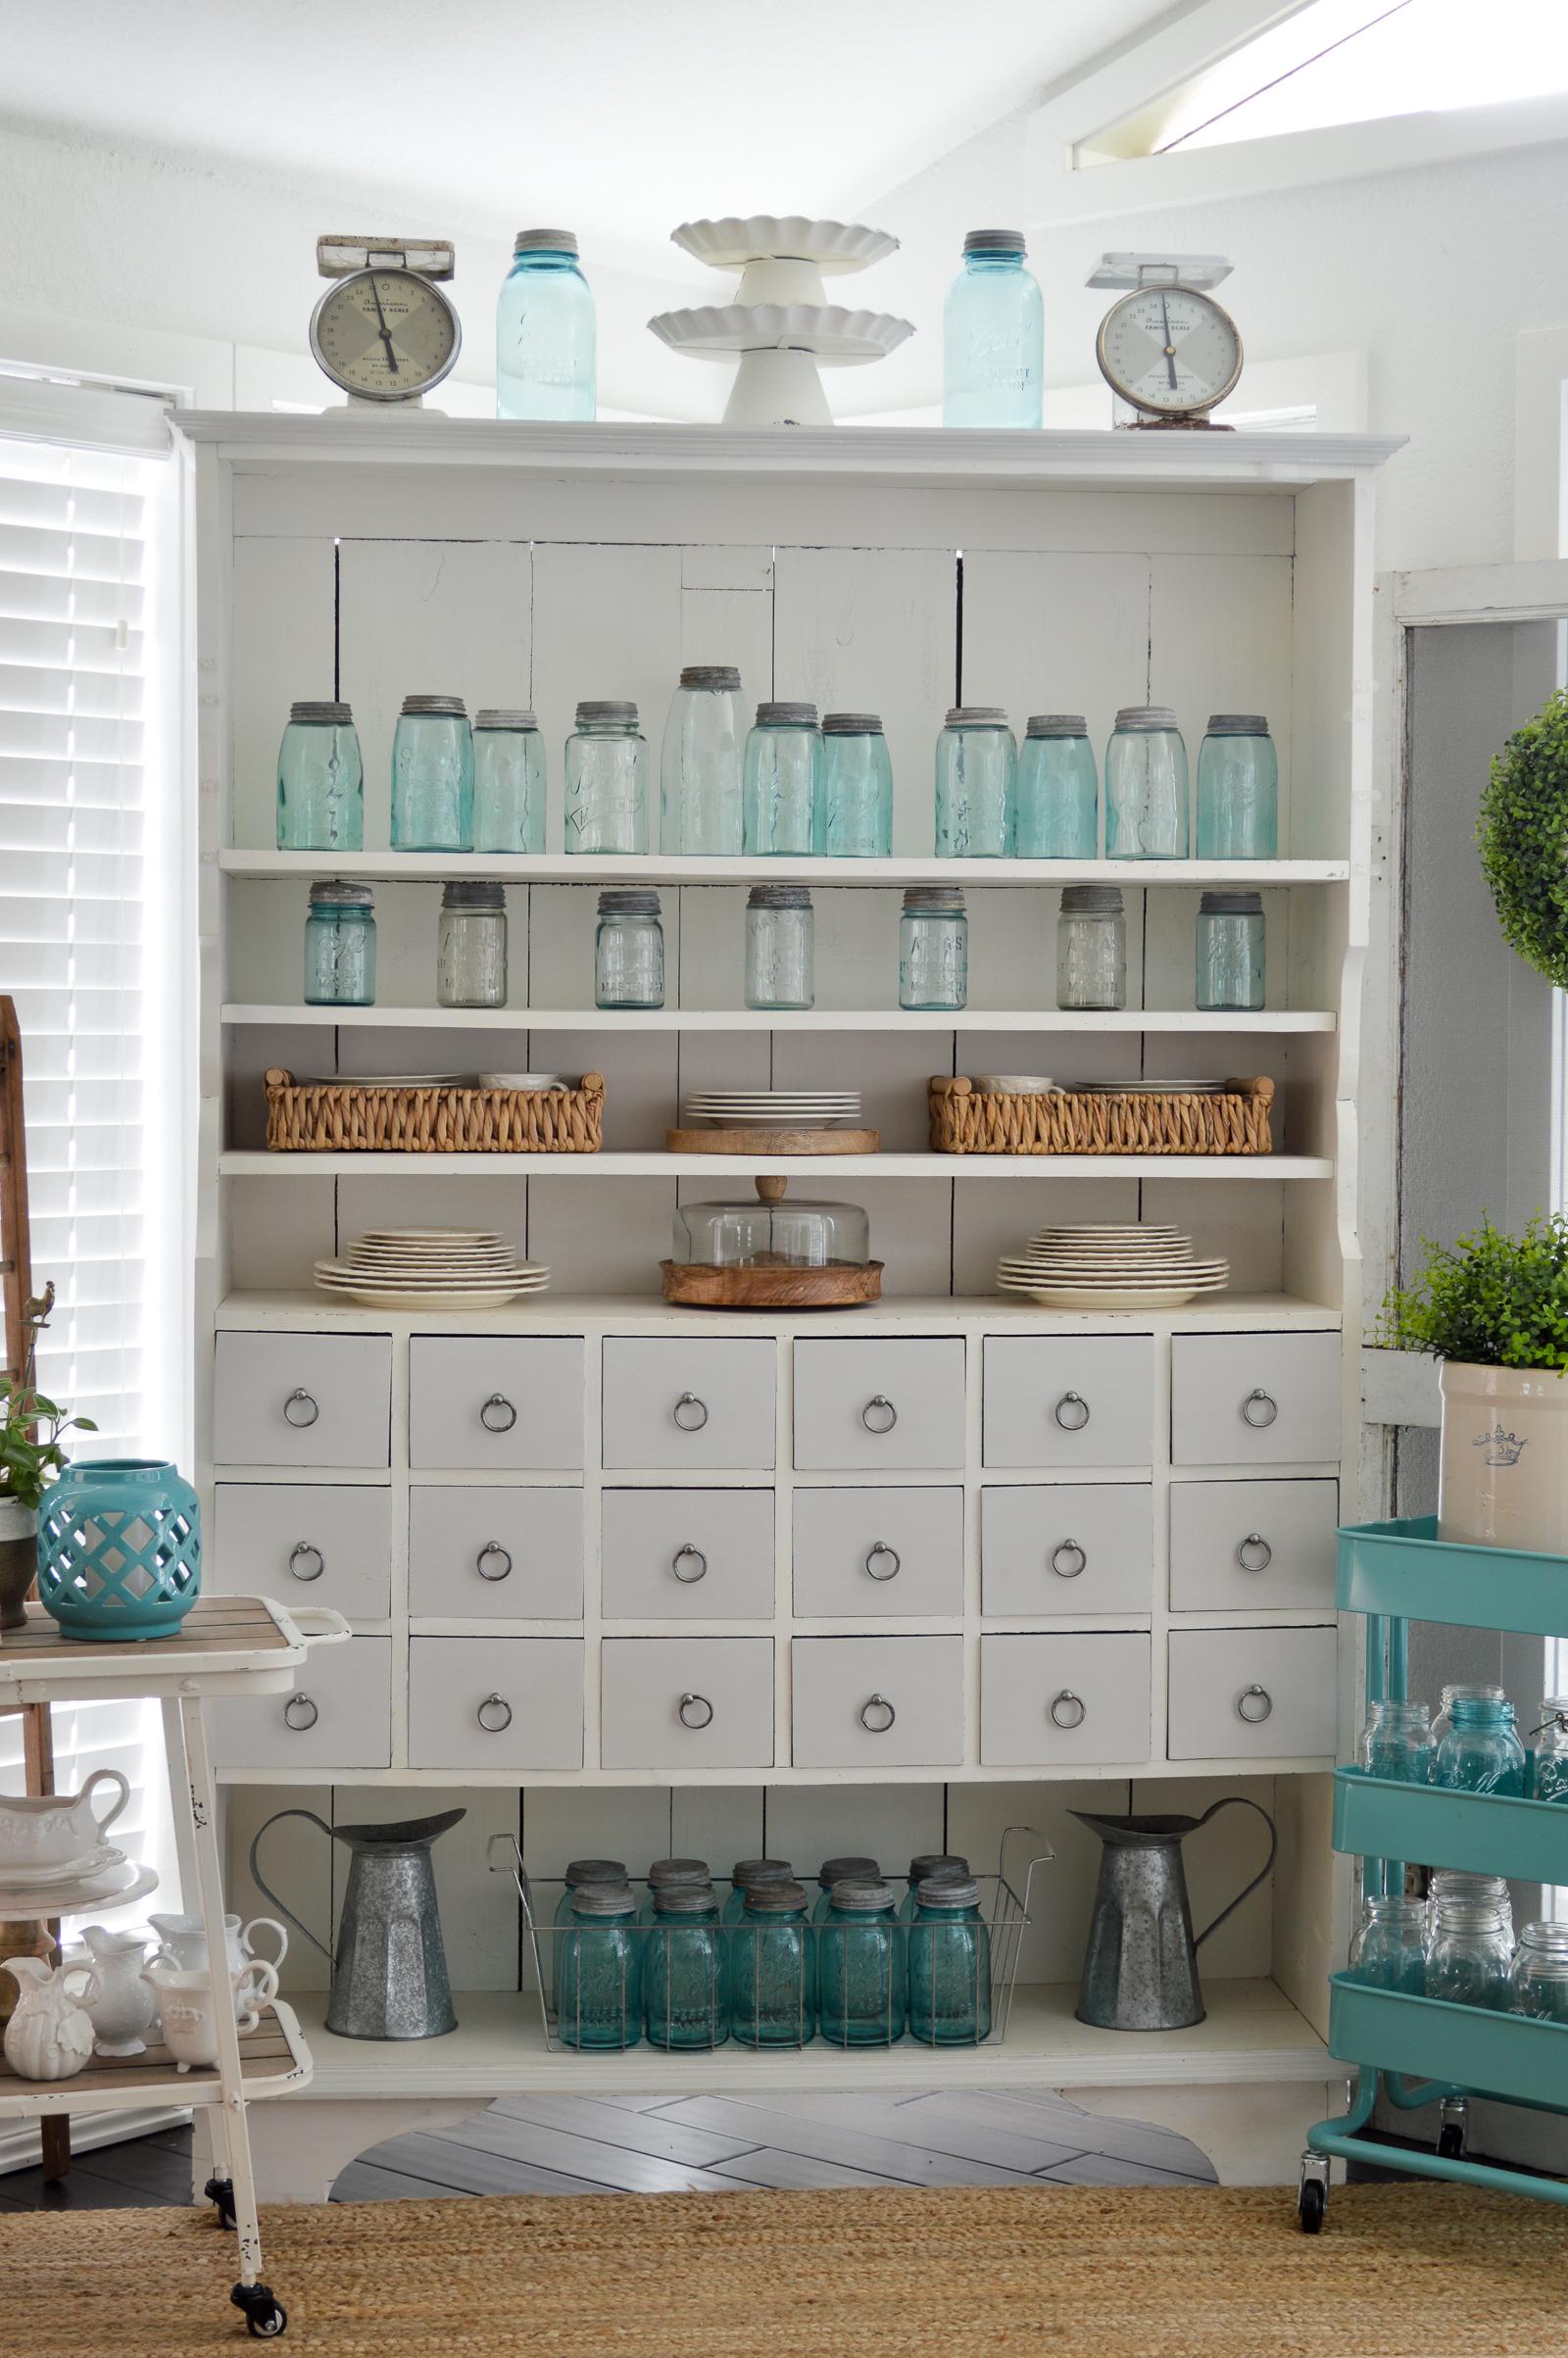 Vintage Mason Jar Collection - Aqua Blue Ball, Boyd, etc at www.foxhollowcottage.com